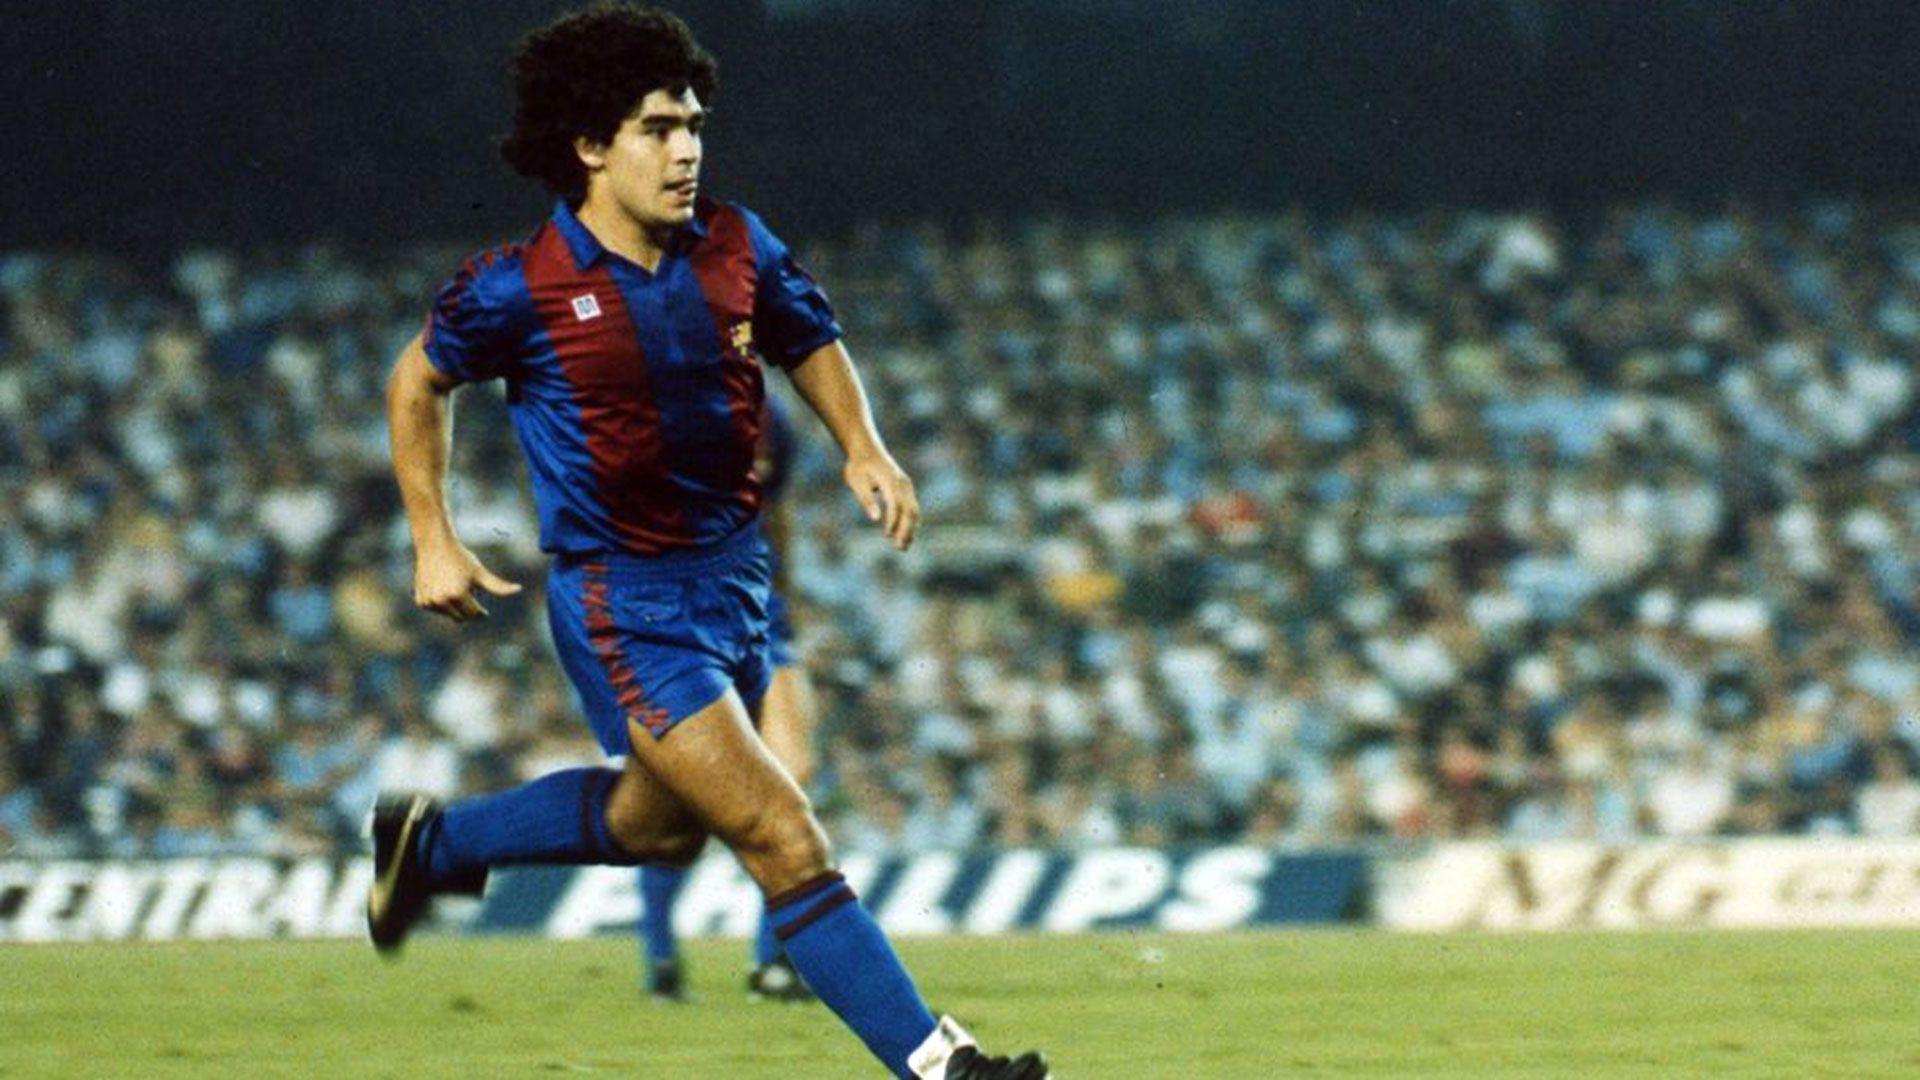 Maradona fichó por el FC Barcelona en 1982 (Barcelona FC)